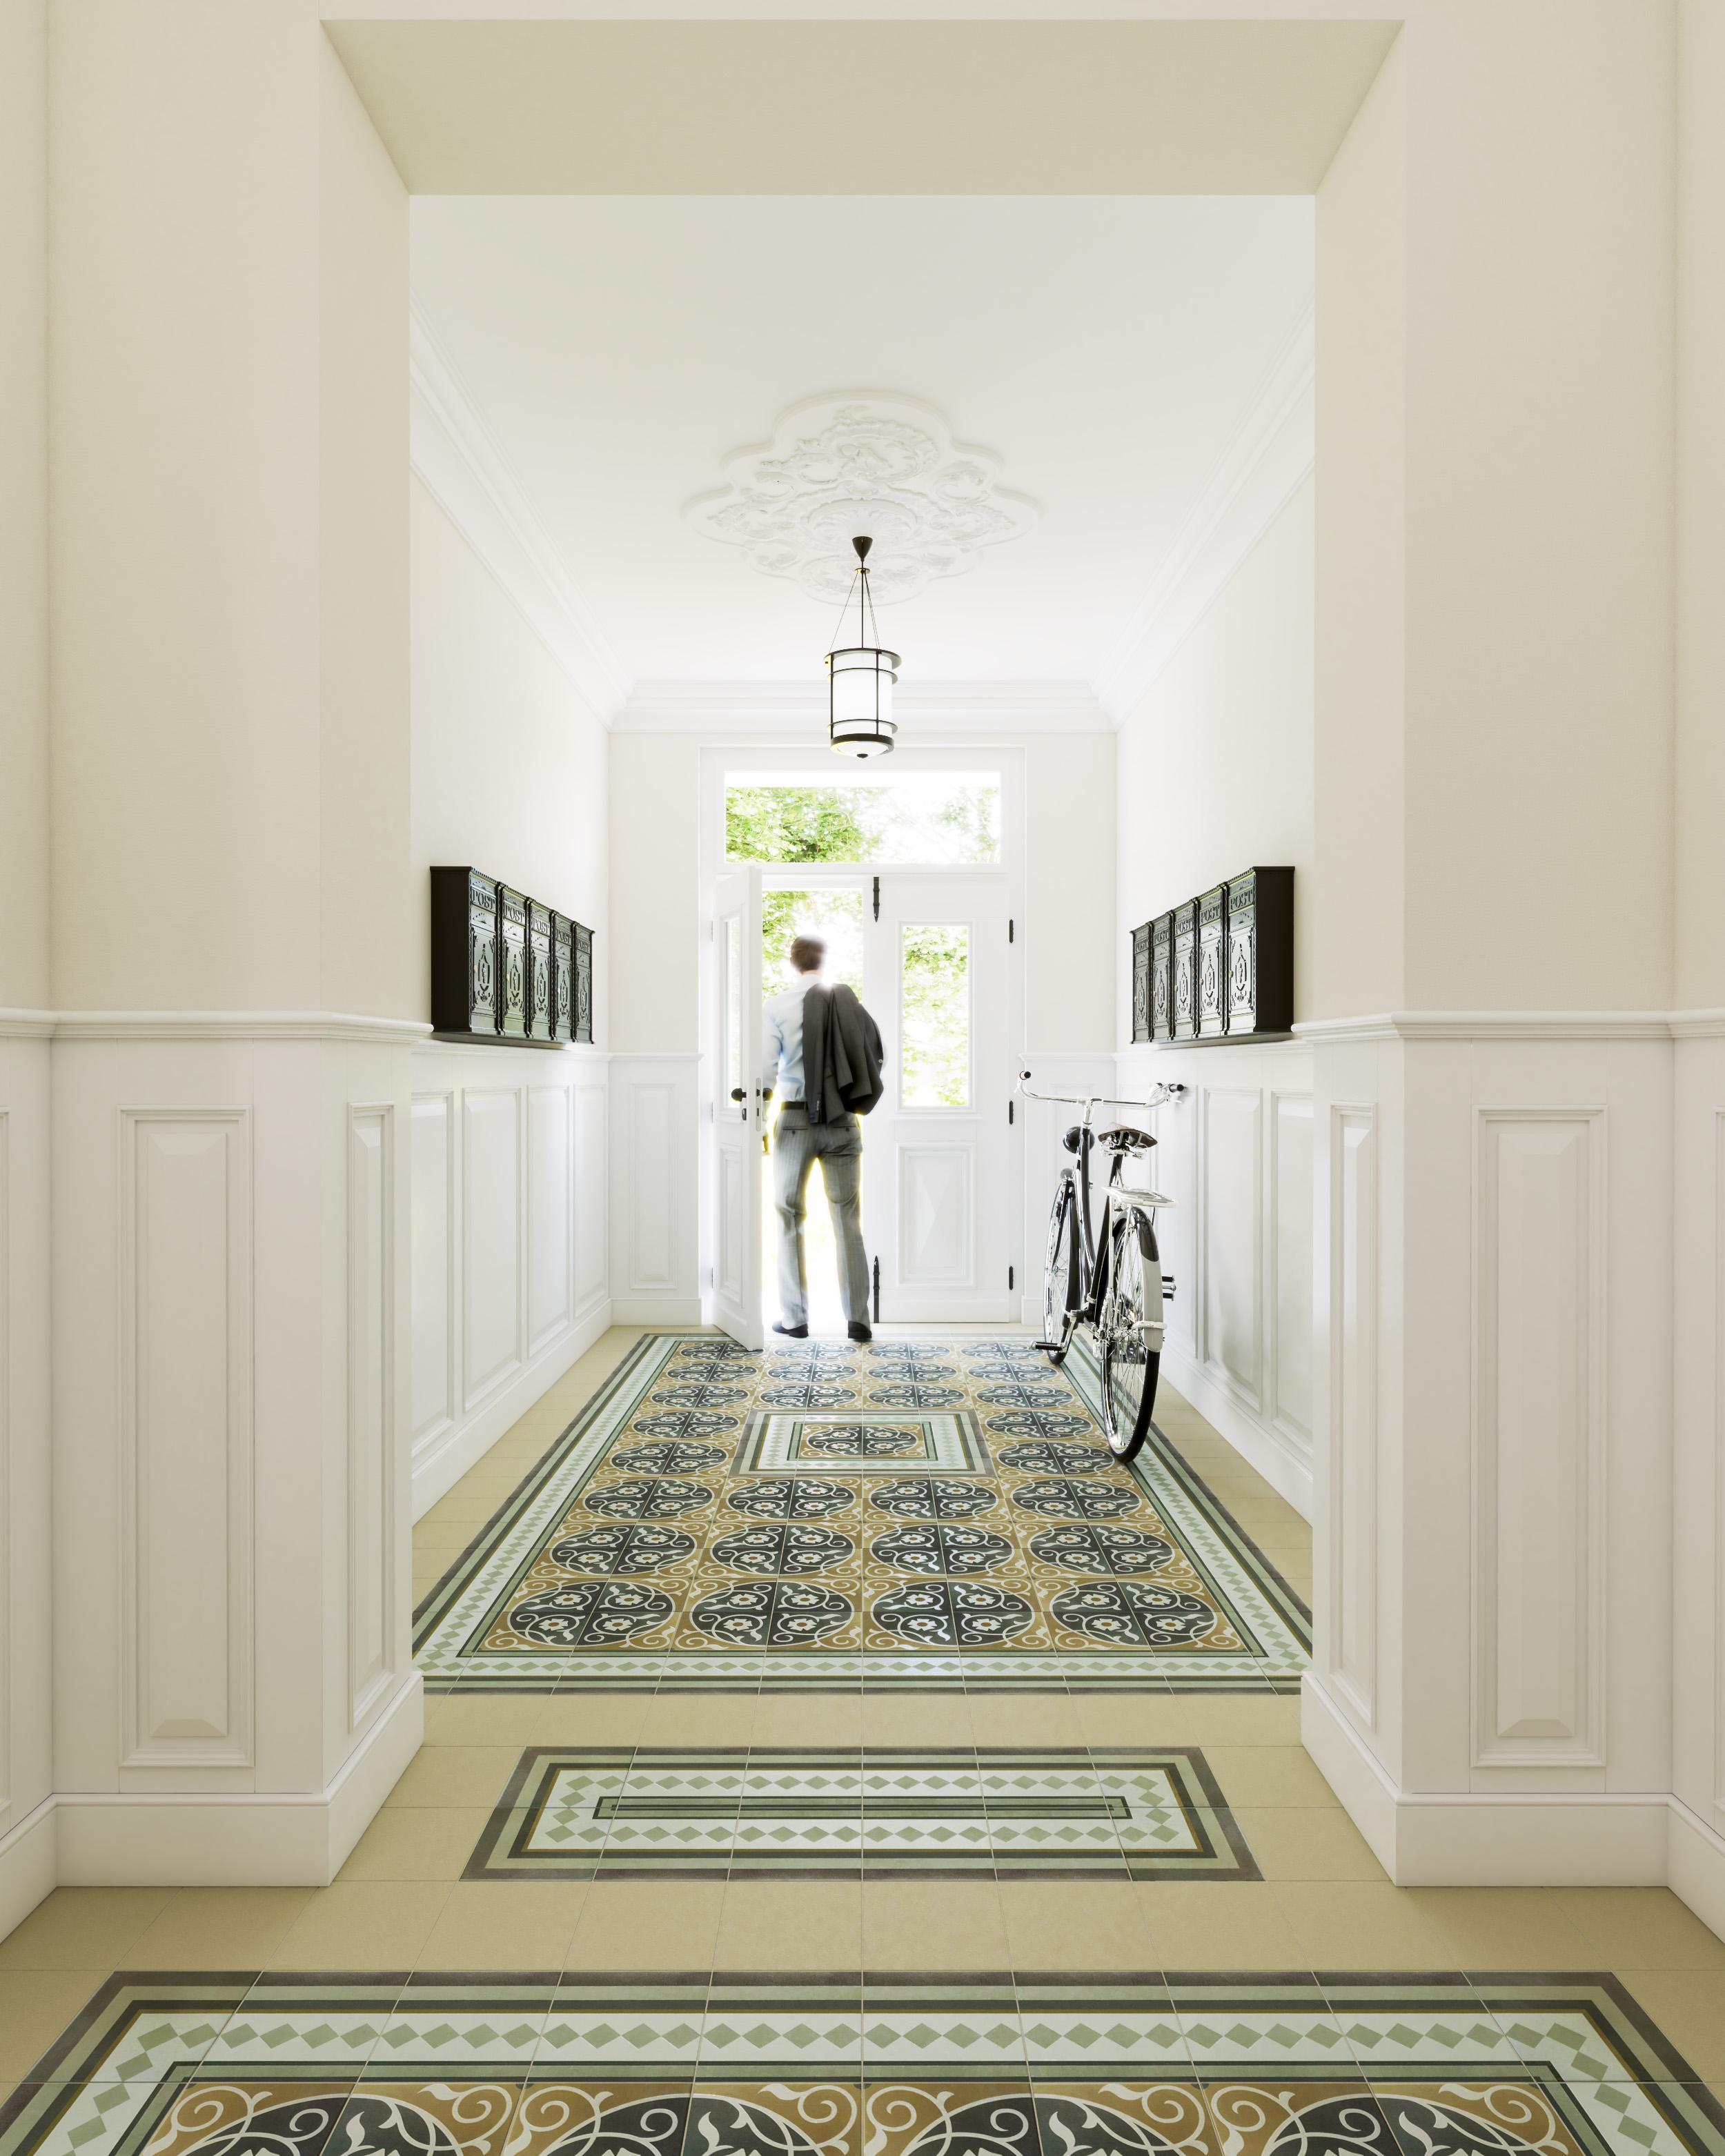 Visualisierung-Treppenhaus-Eingang